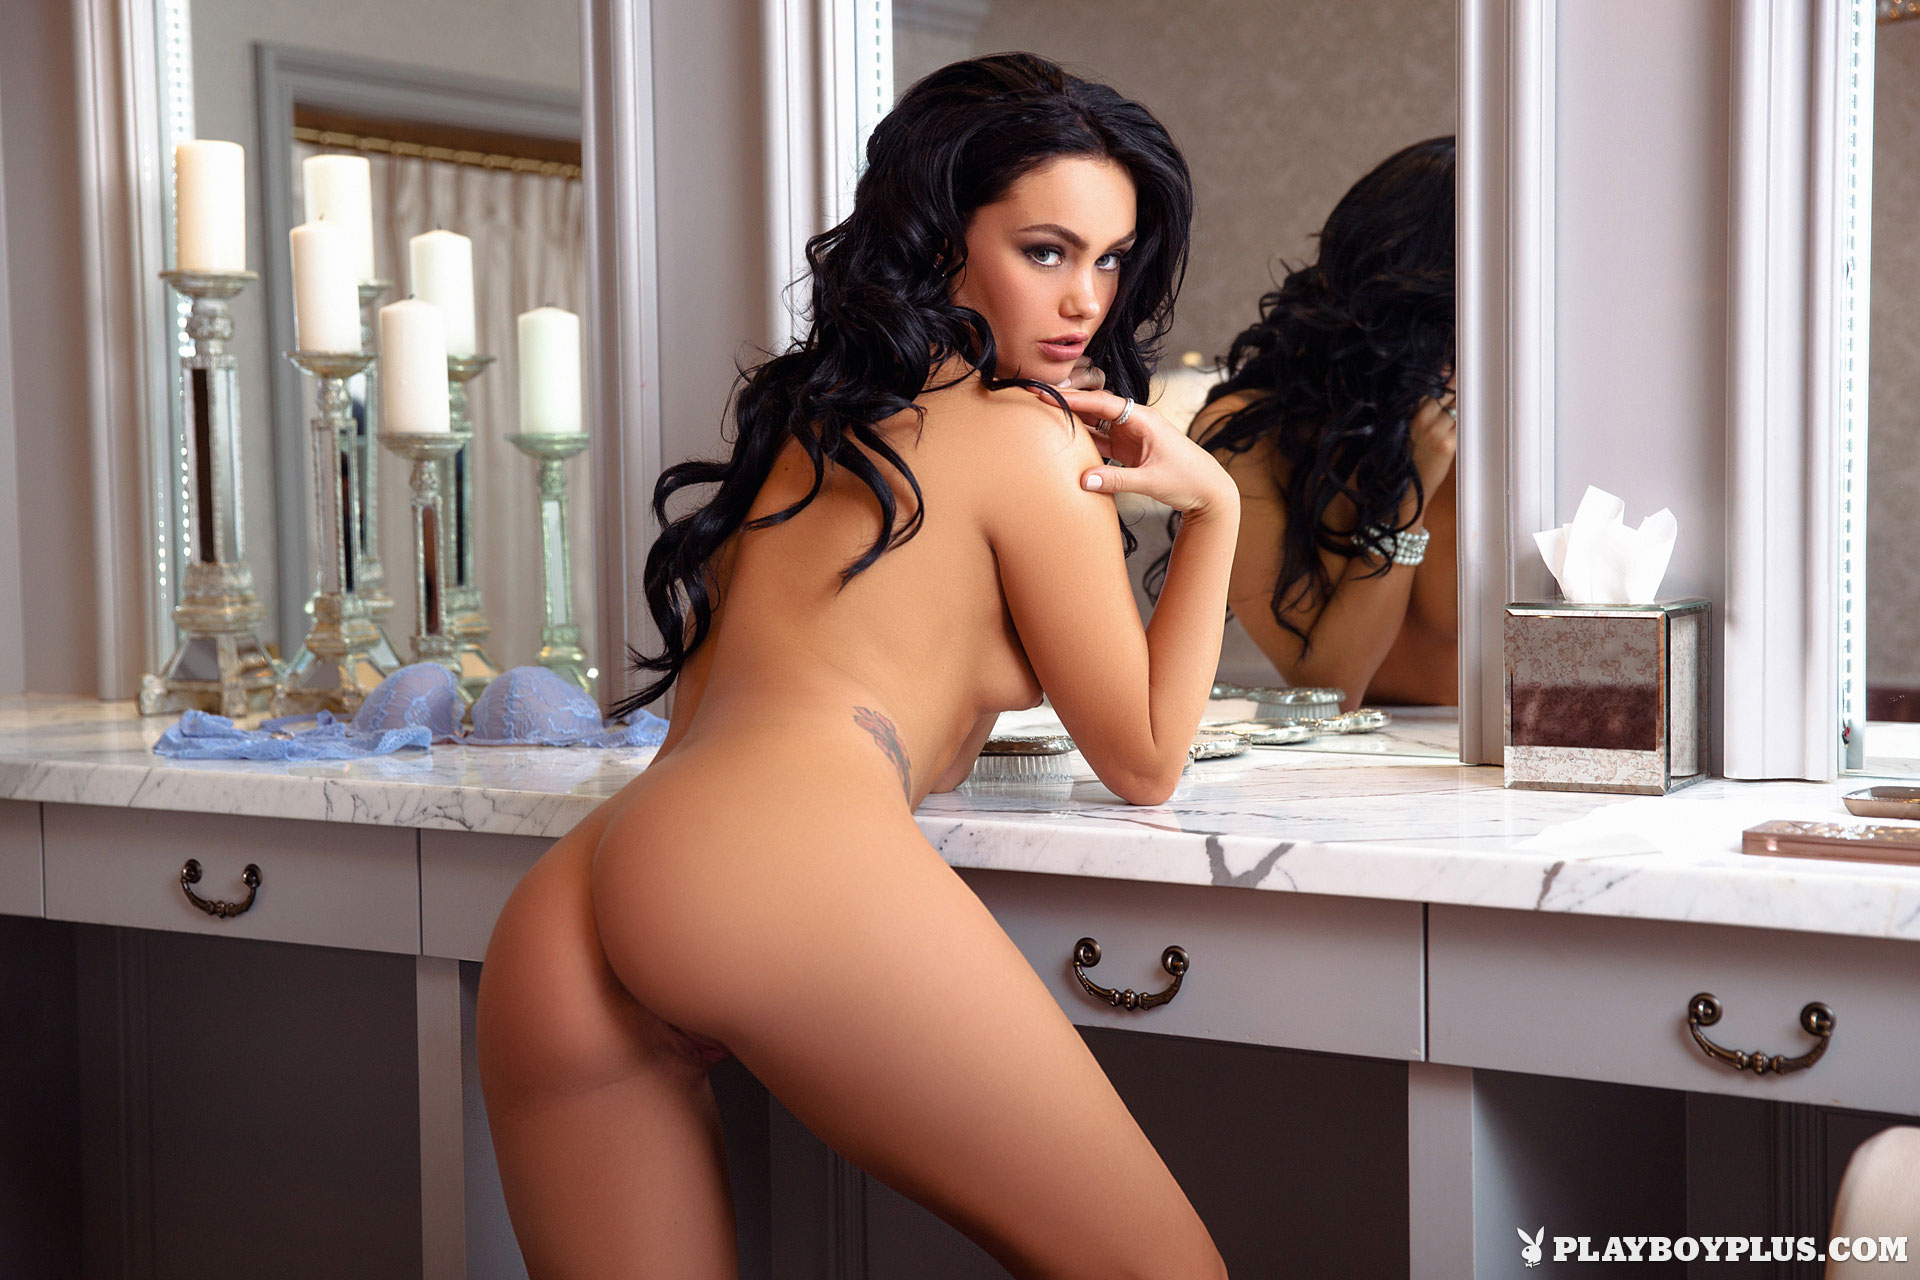 kristie-taylor-mirror-nude-brunette-playboy-11